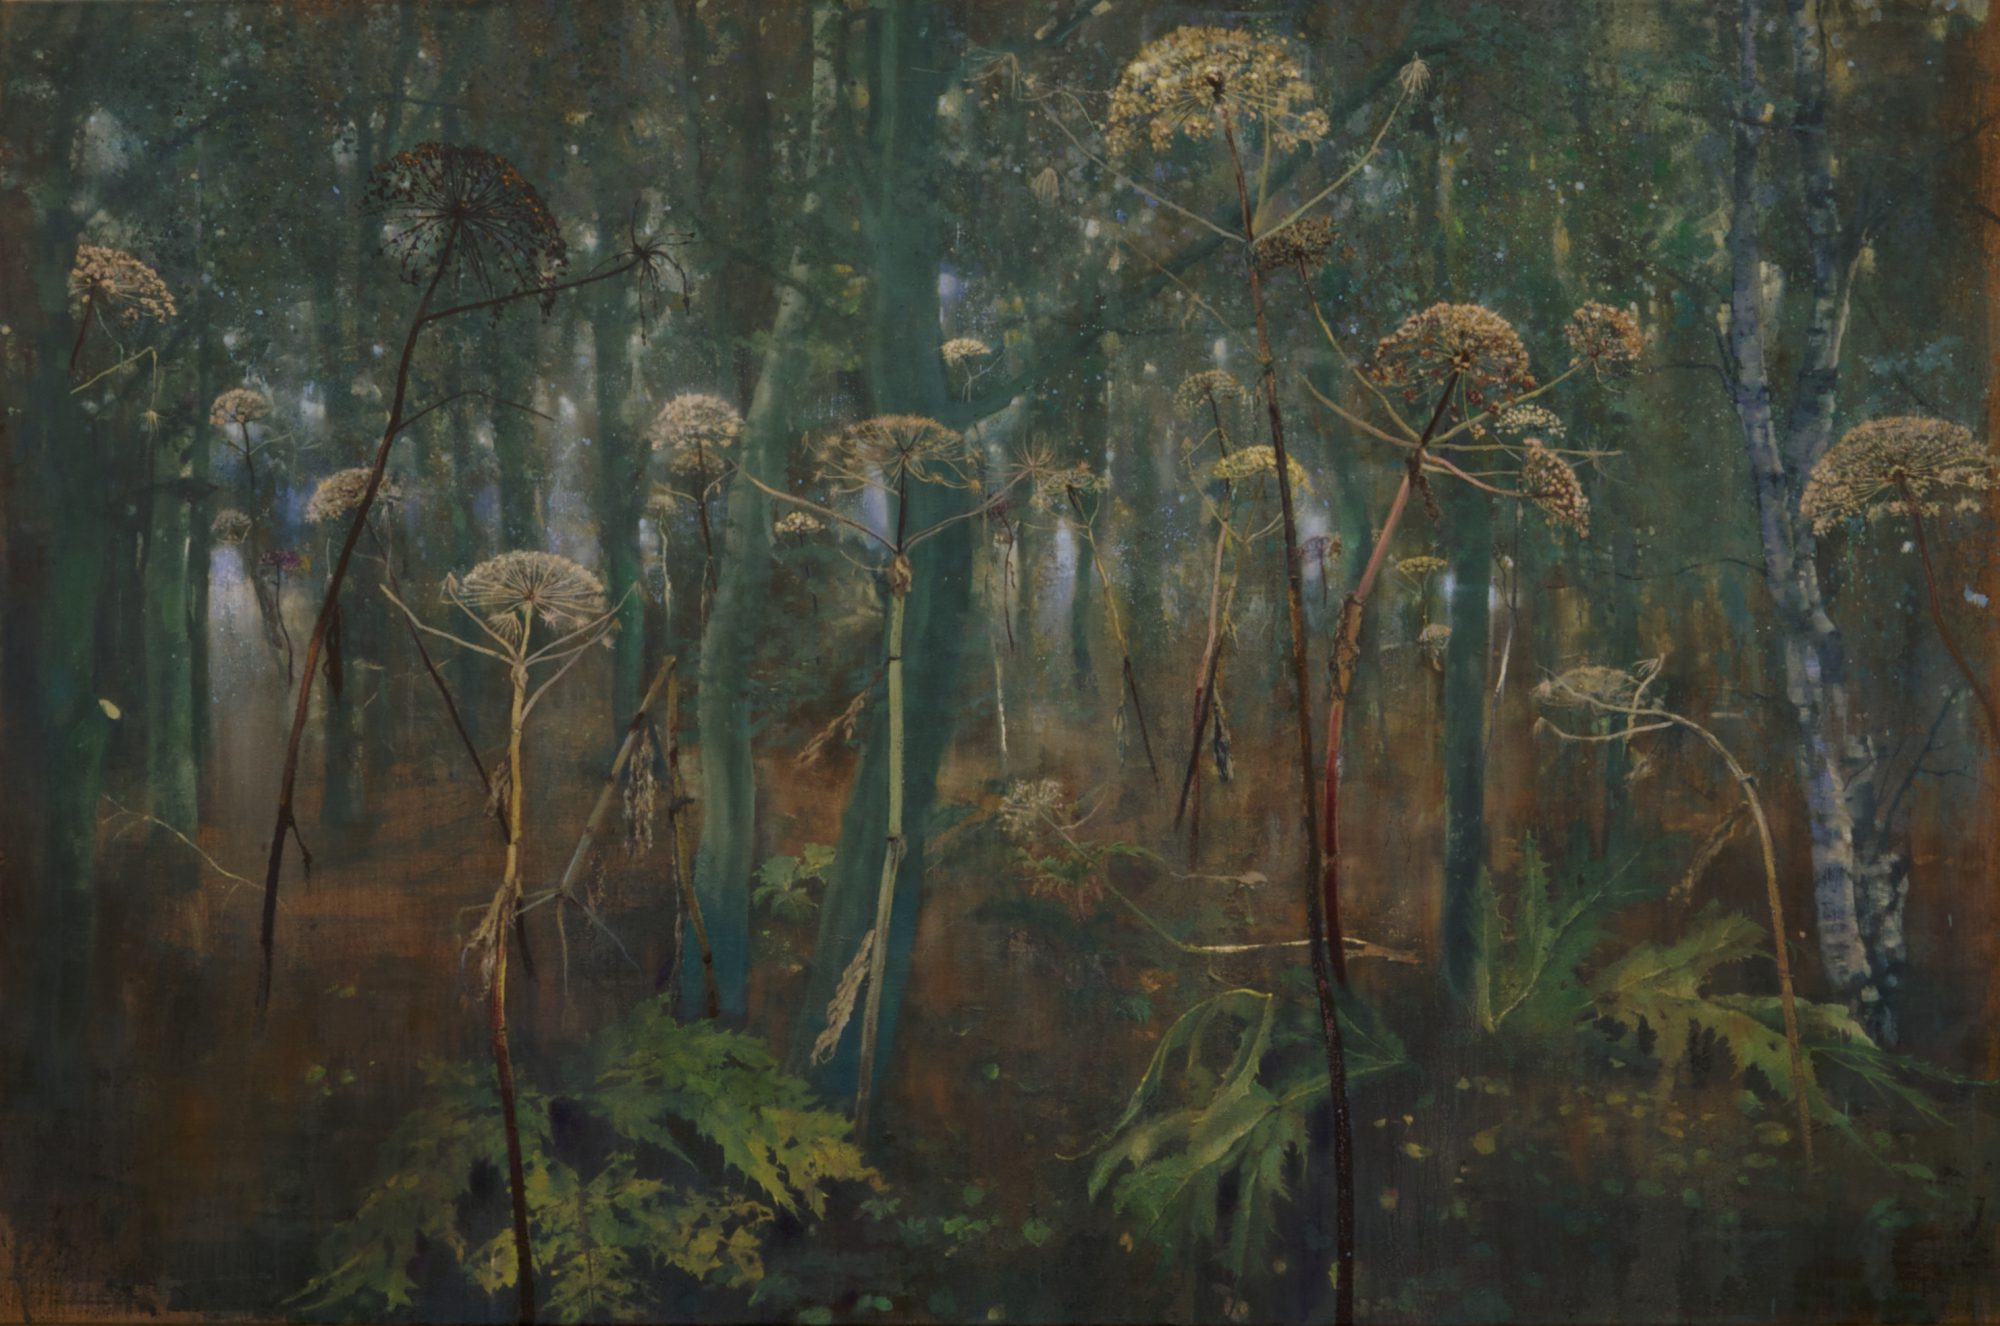 schilderij Isabella Werkhoven berenklauwen #6 in bos isabella werkhoven painting giant hogweed in the forest